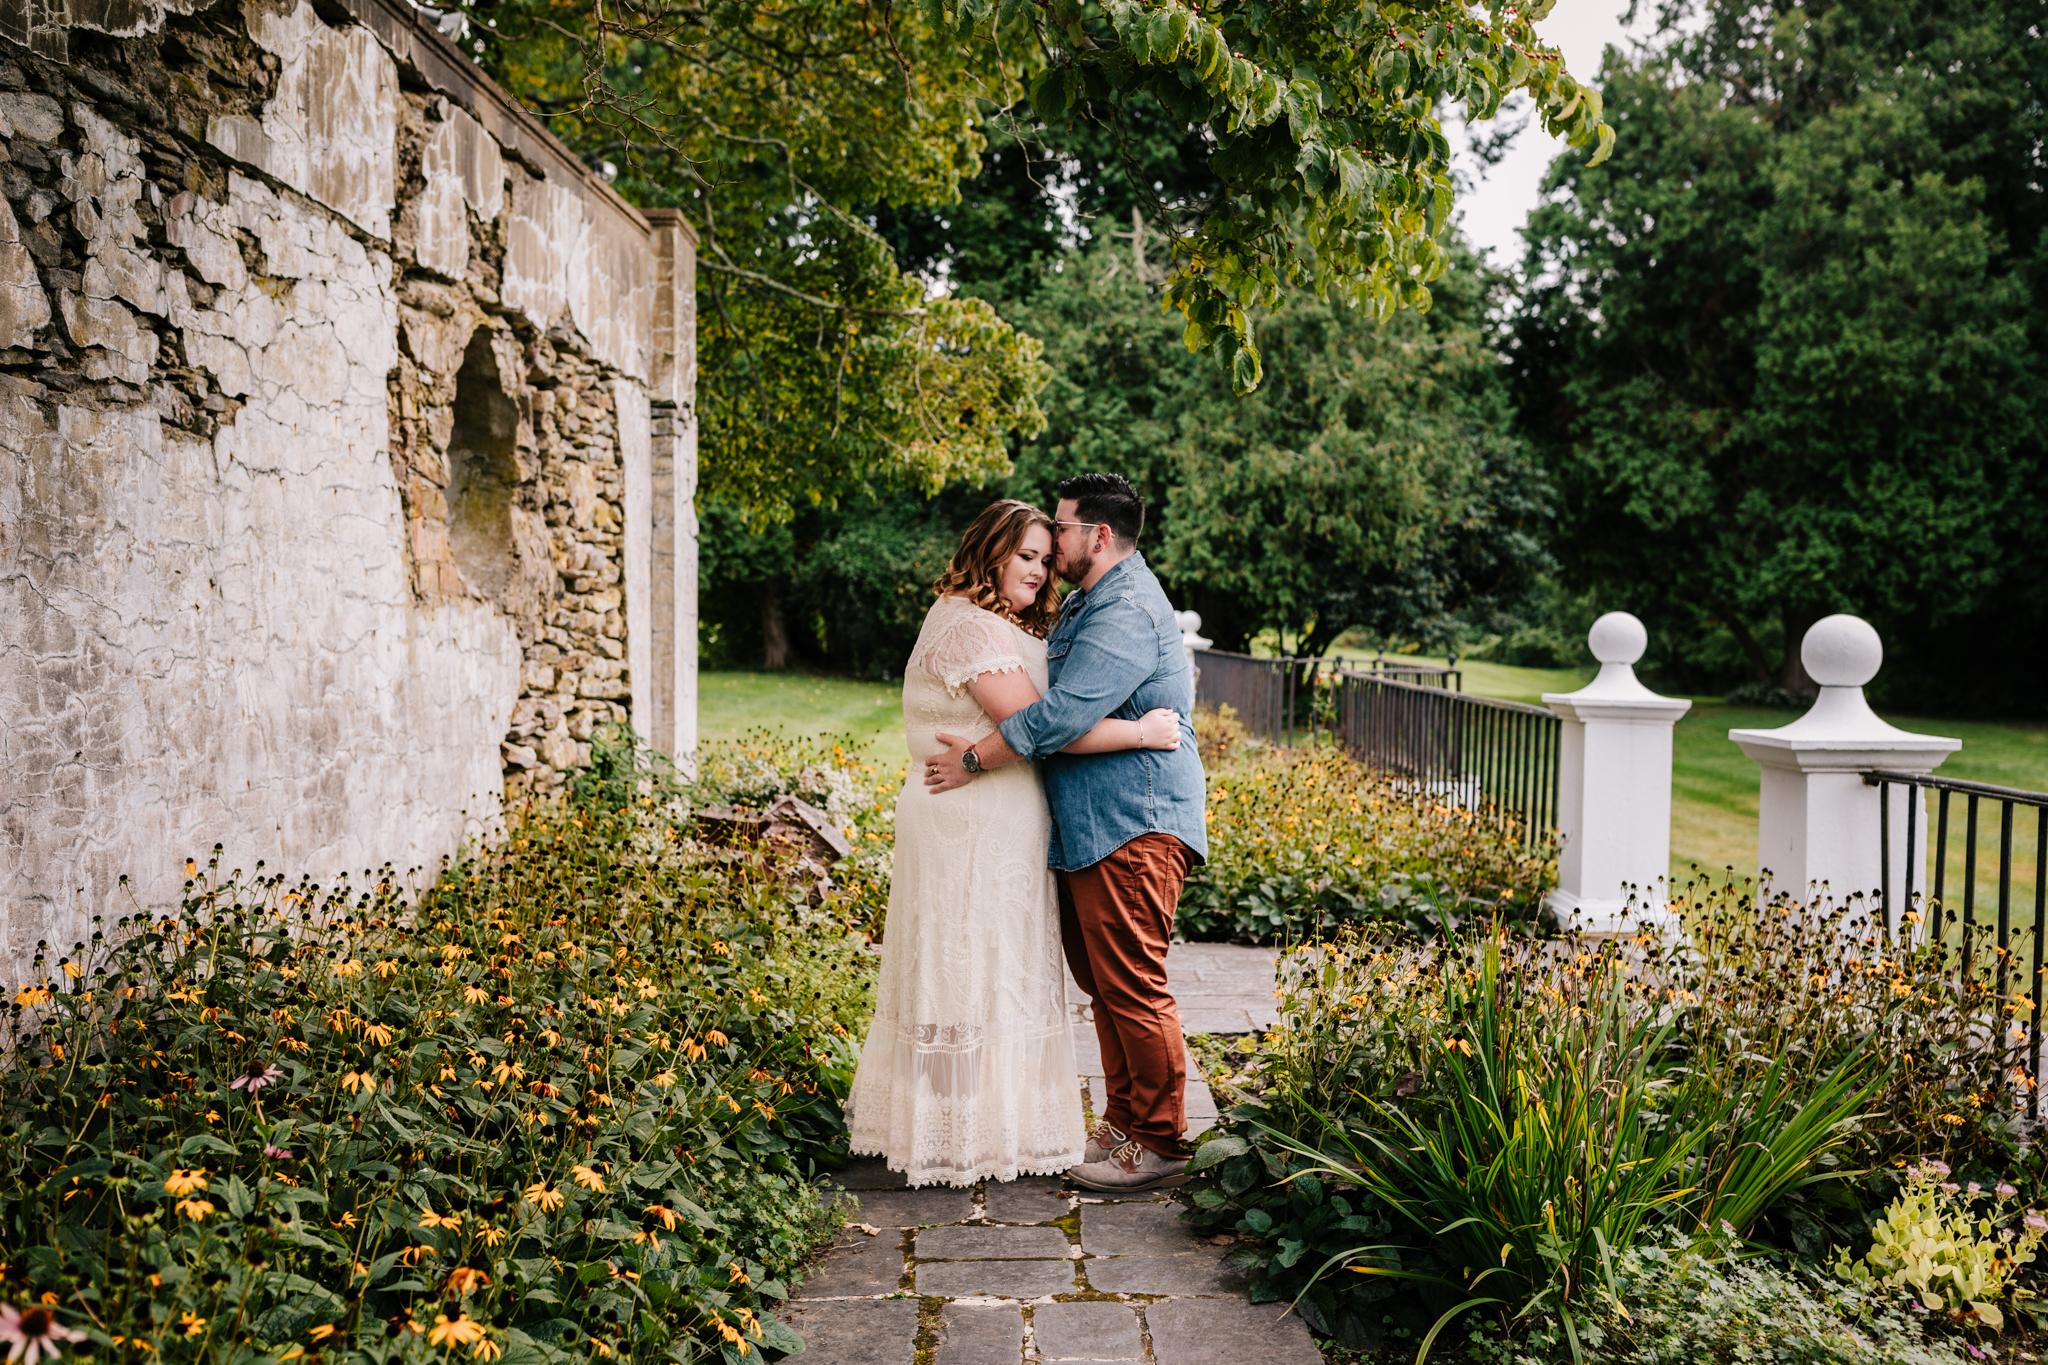 southwest-albuquerque-phoenix-engagement-photographer-gwyn-careg-inn-weddings-andrea-van-orsouw-photography-3.jpg